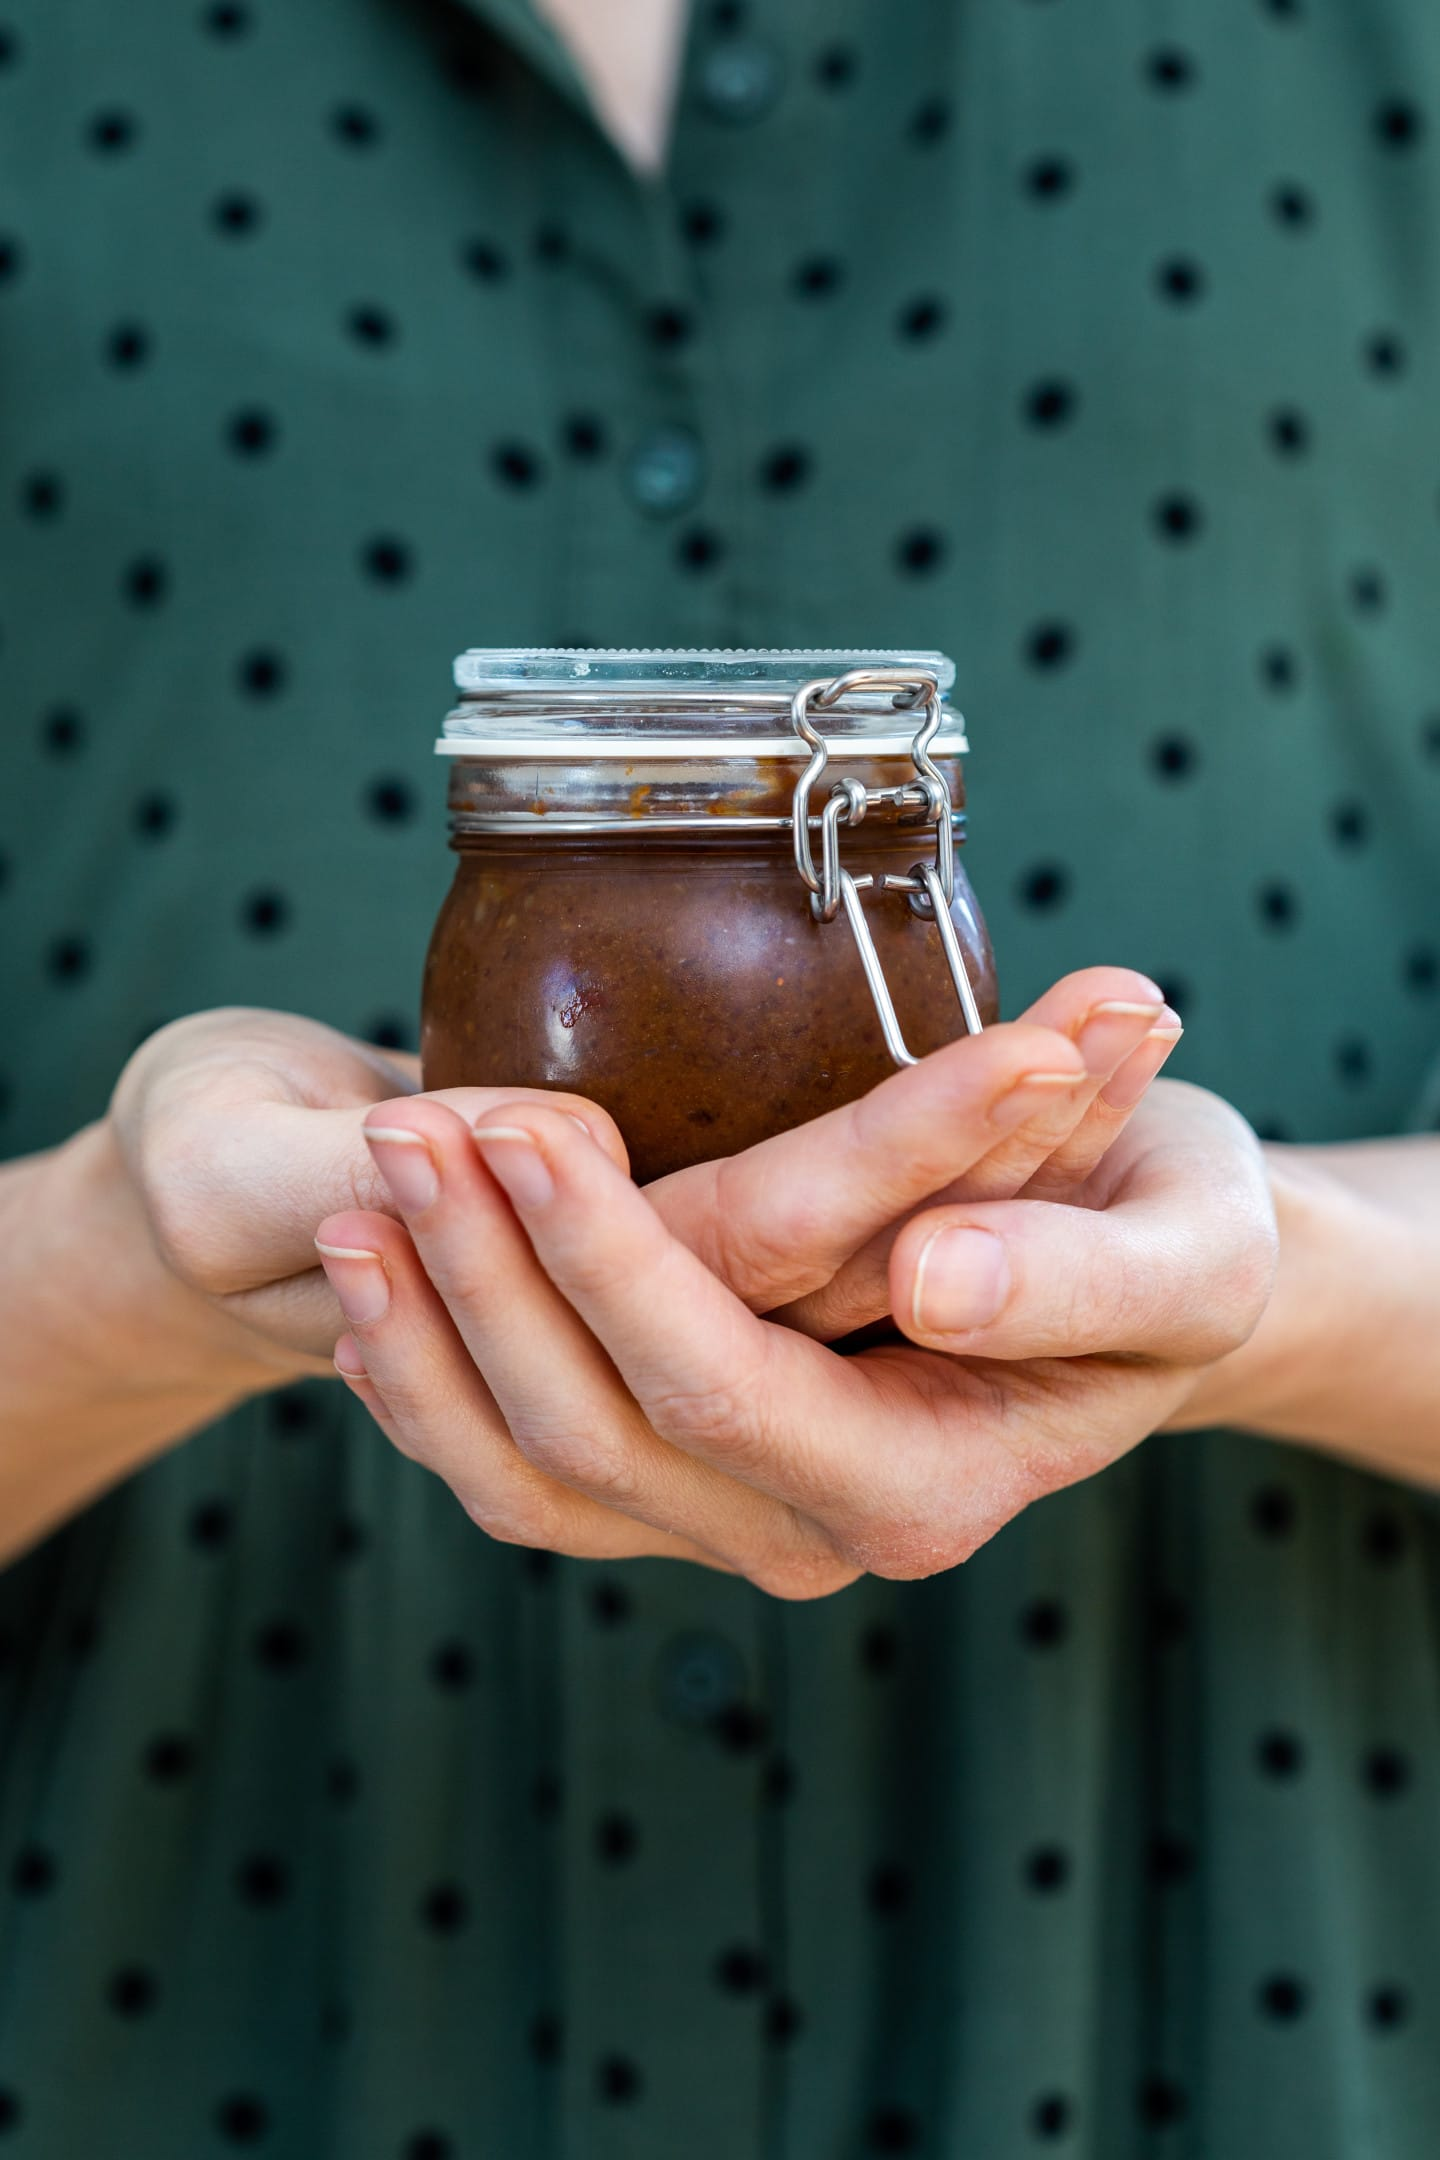 Female hands holding homemade tamarind paste jar